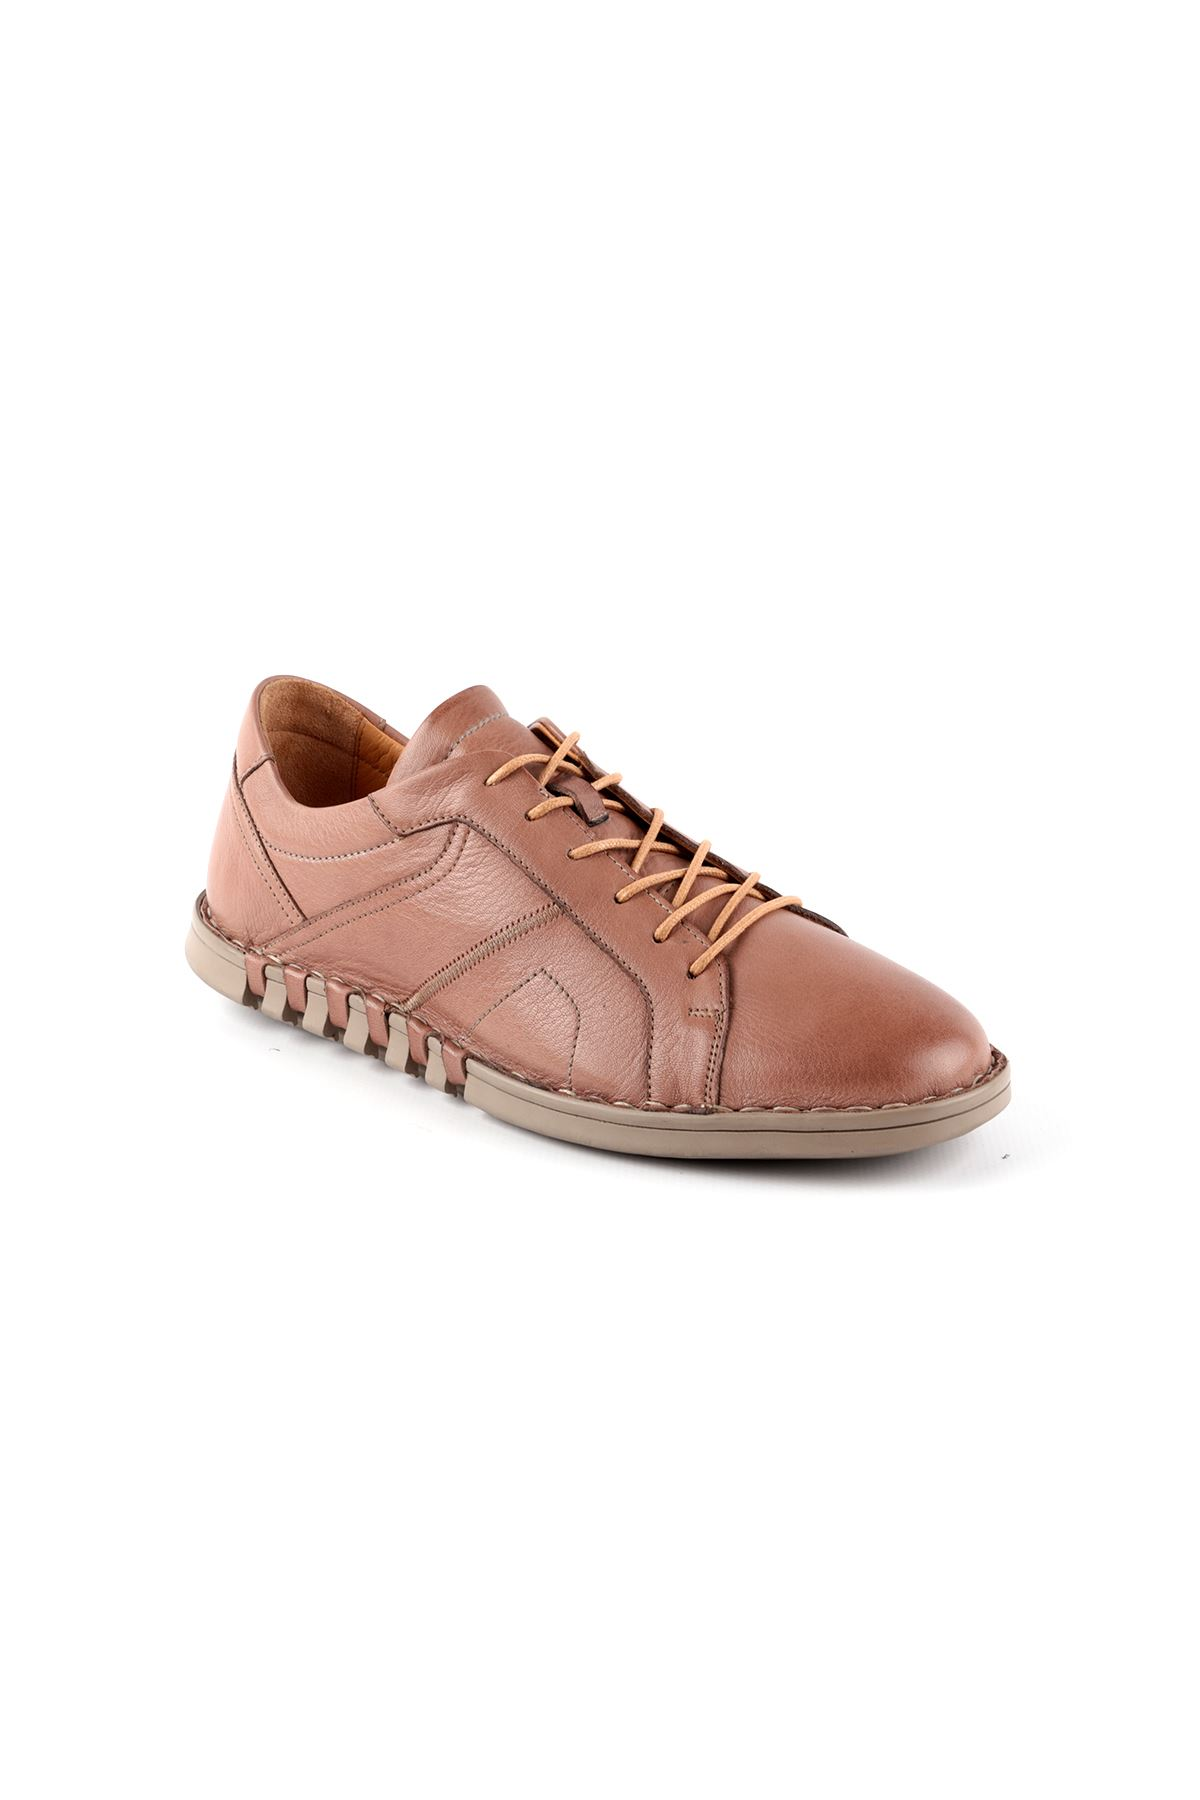 Libero L3764 Vizon Casual Erkek Ayakkabı